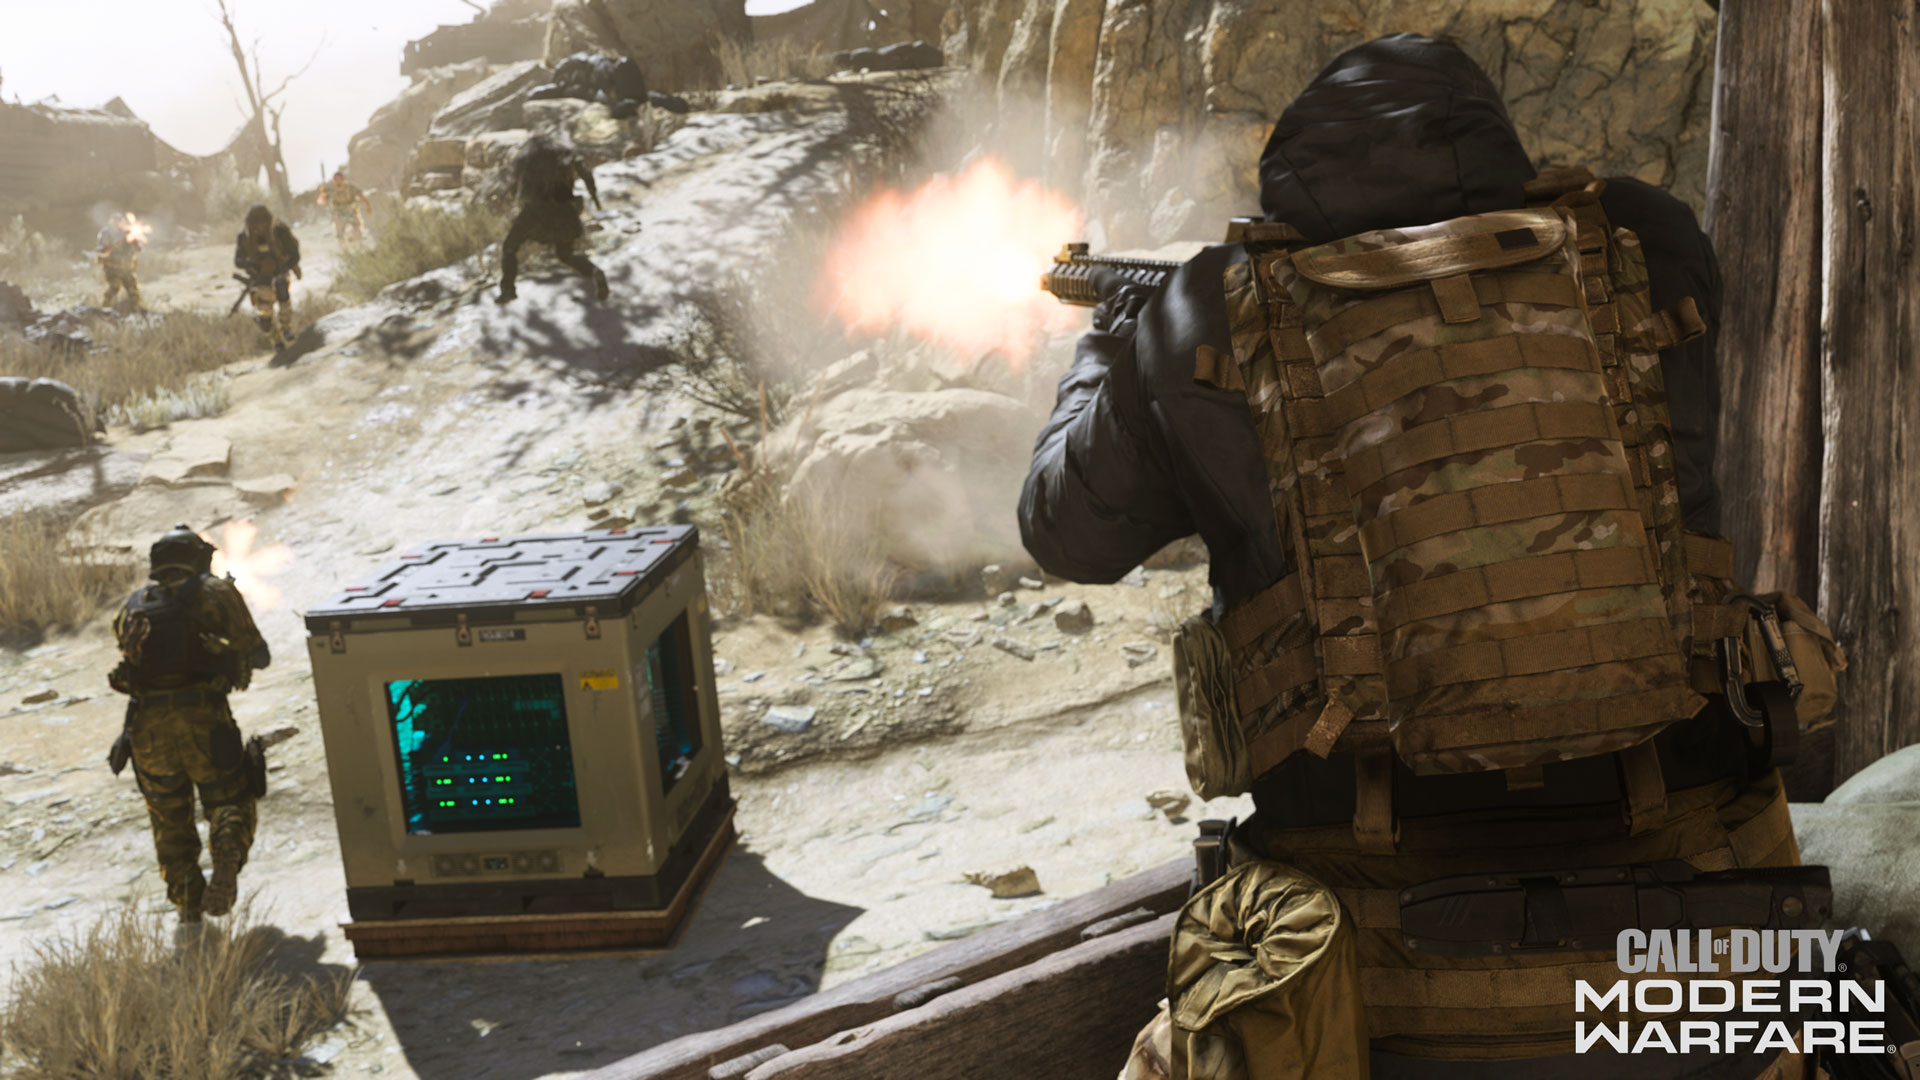 Comment fonctionne le cross-play PC, PS4 et Xbox One sur Call of Duty : Modern Warfare ?